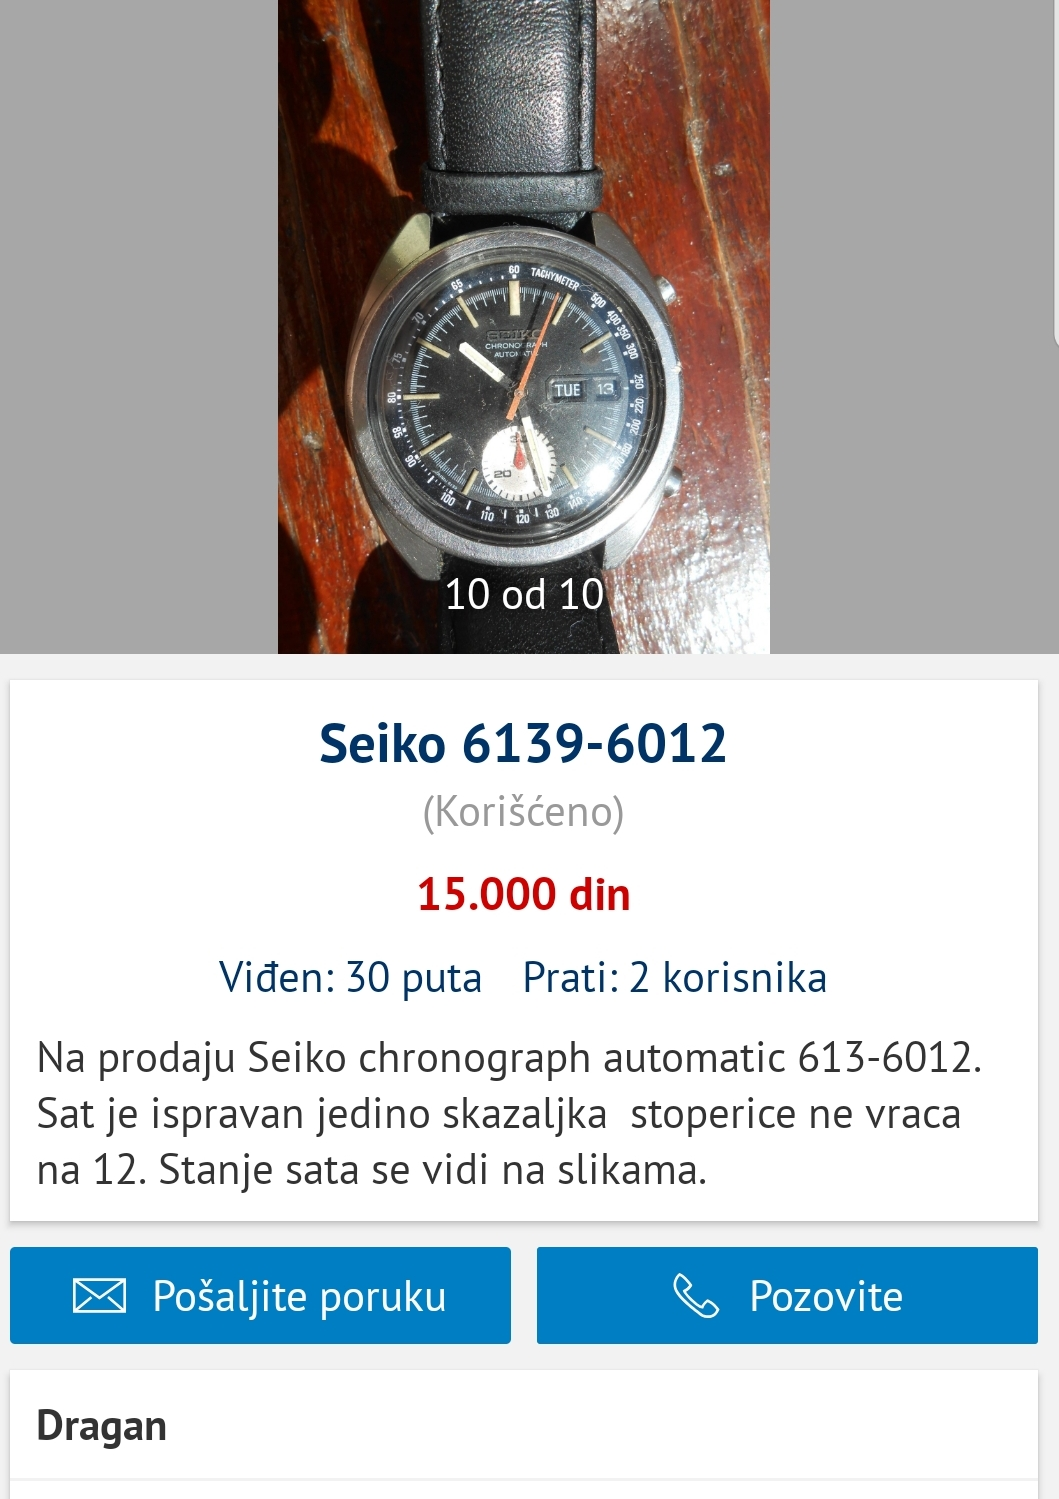 Naziv: SmartSelect_20190813-134554_KupujemProdajem.jpg, pregleda: 217, veličina: 466,8 KB